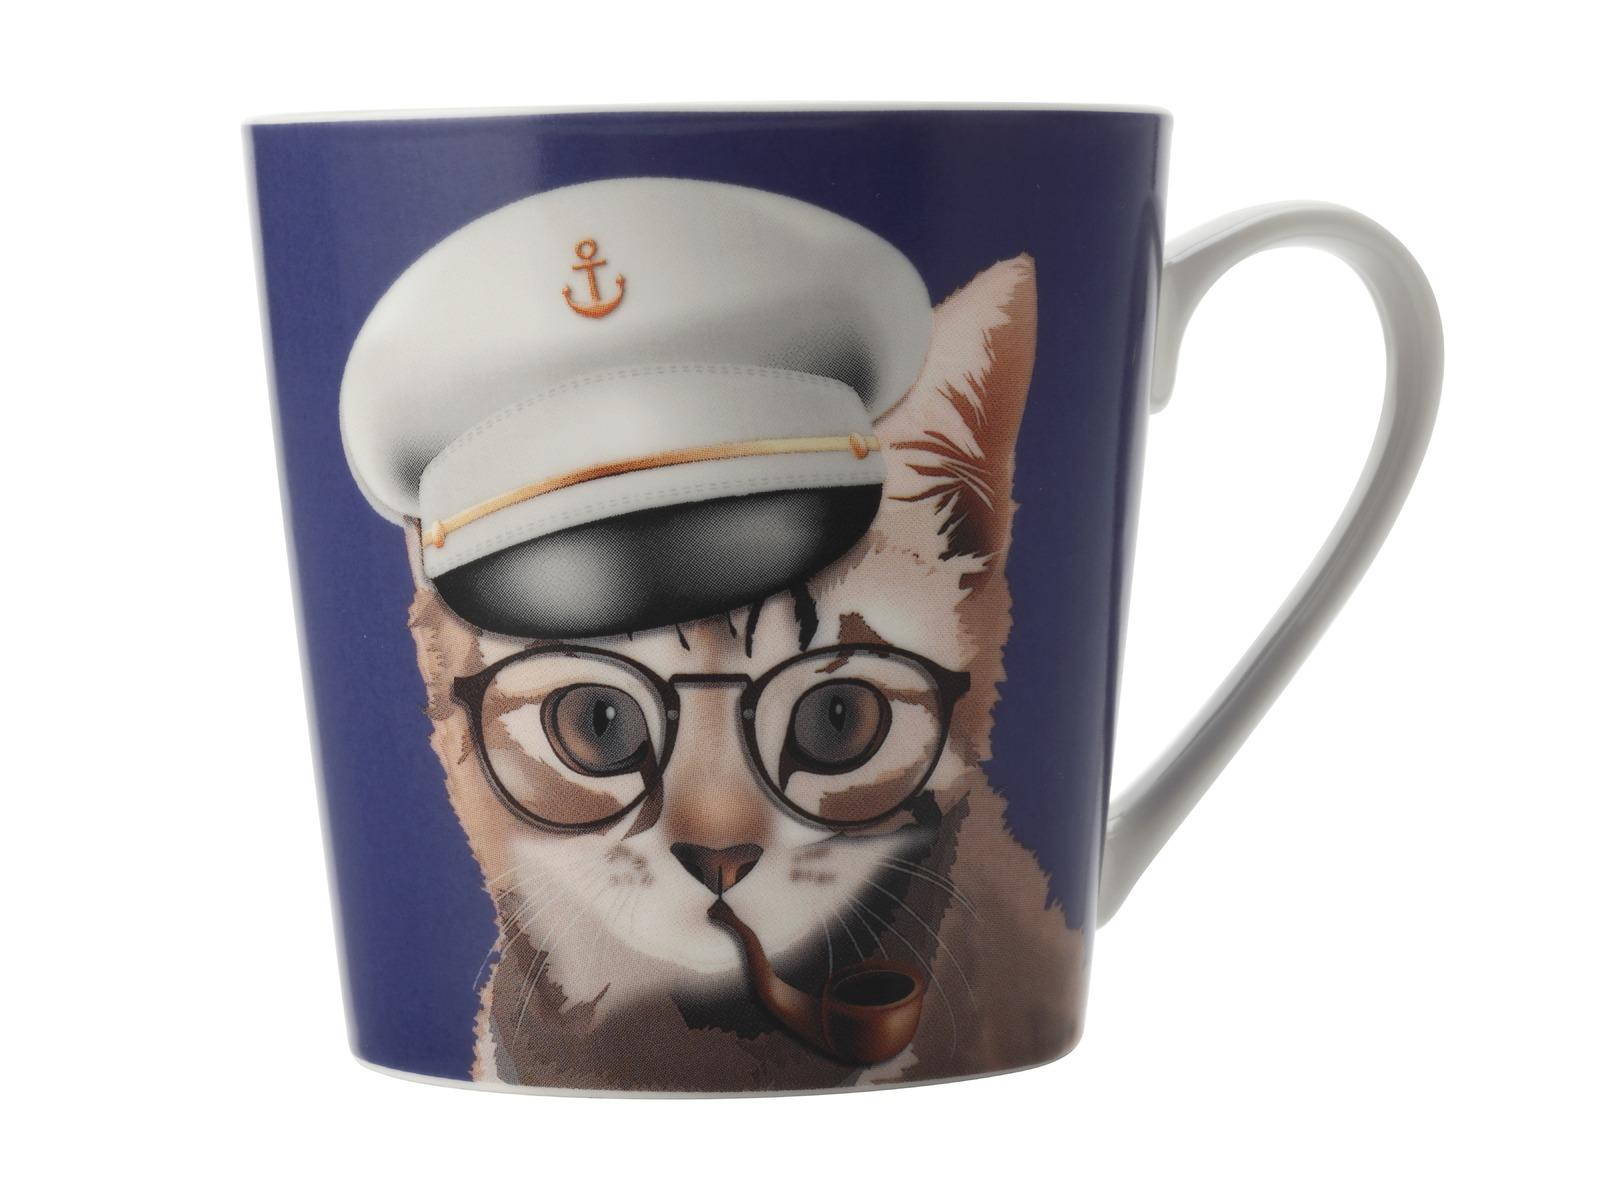 Christopher Vine - Mini Mob The Costume Party Mug Billy Navy (350ml) image